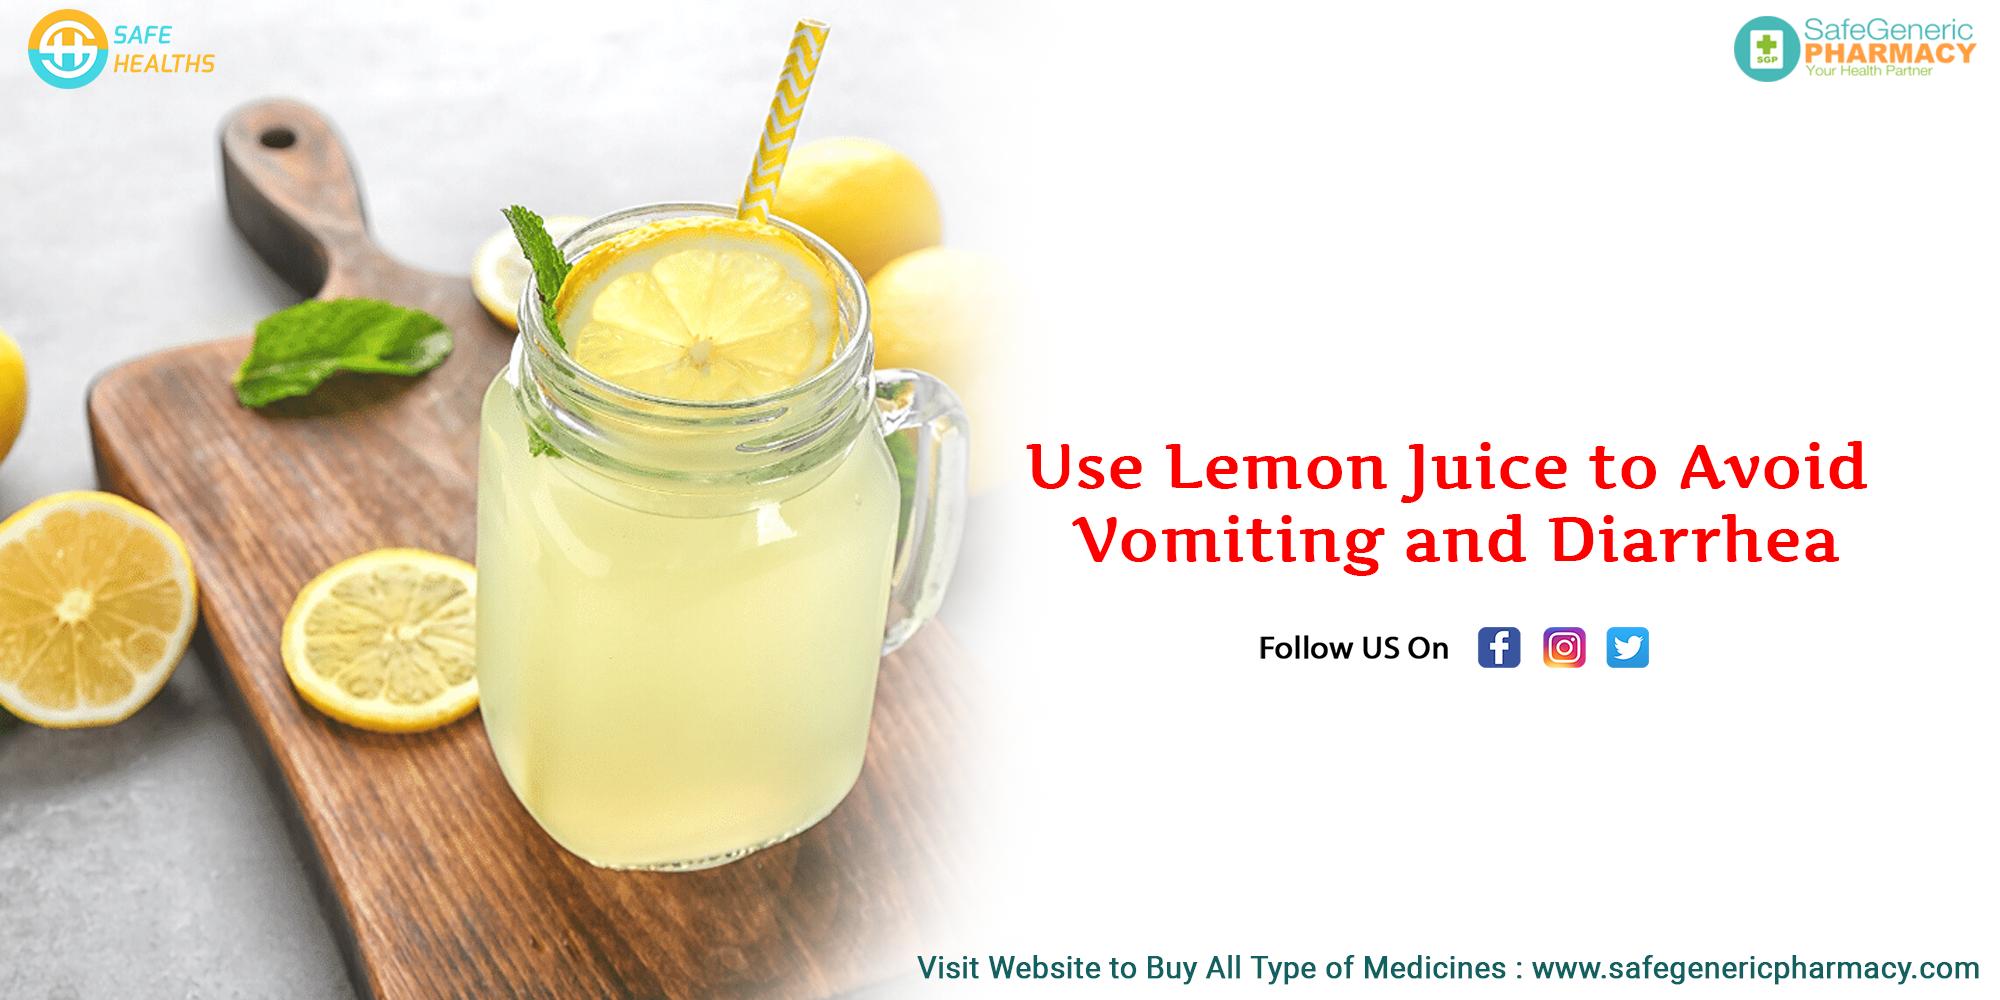 Use Lemon Juice to Avoid Vomiting and Diarrhea